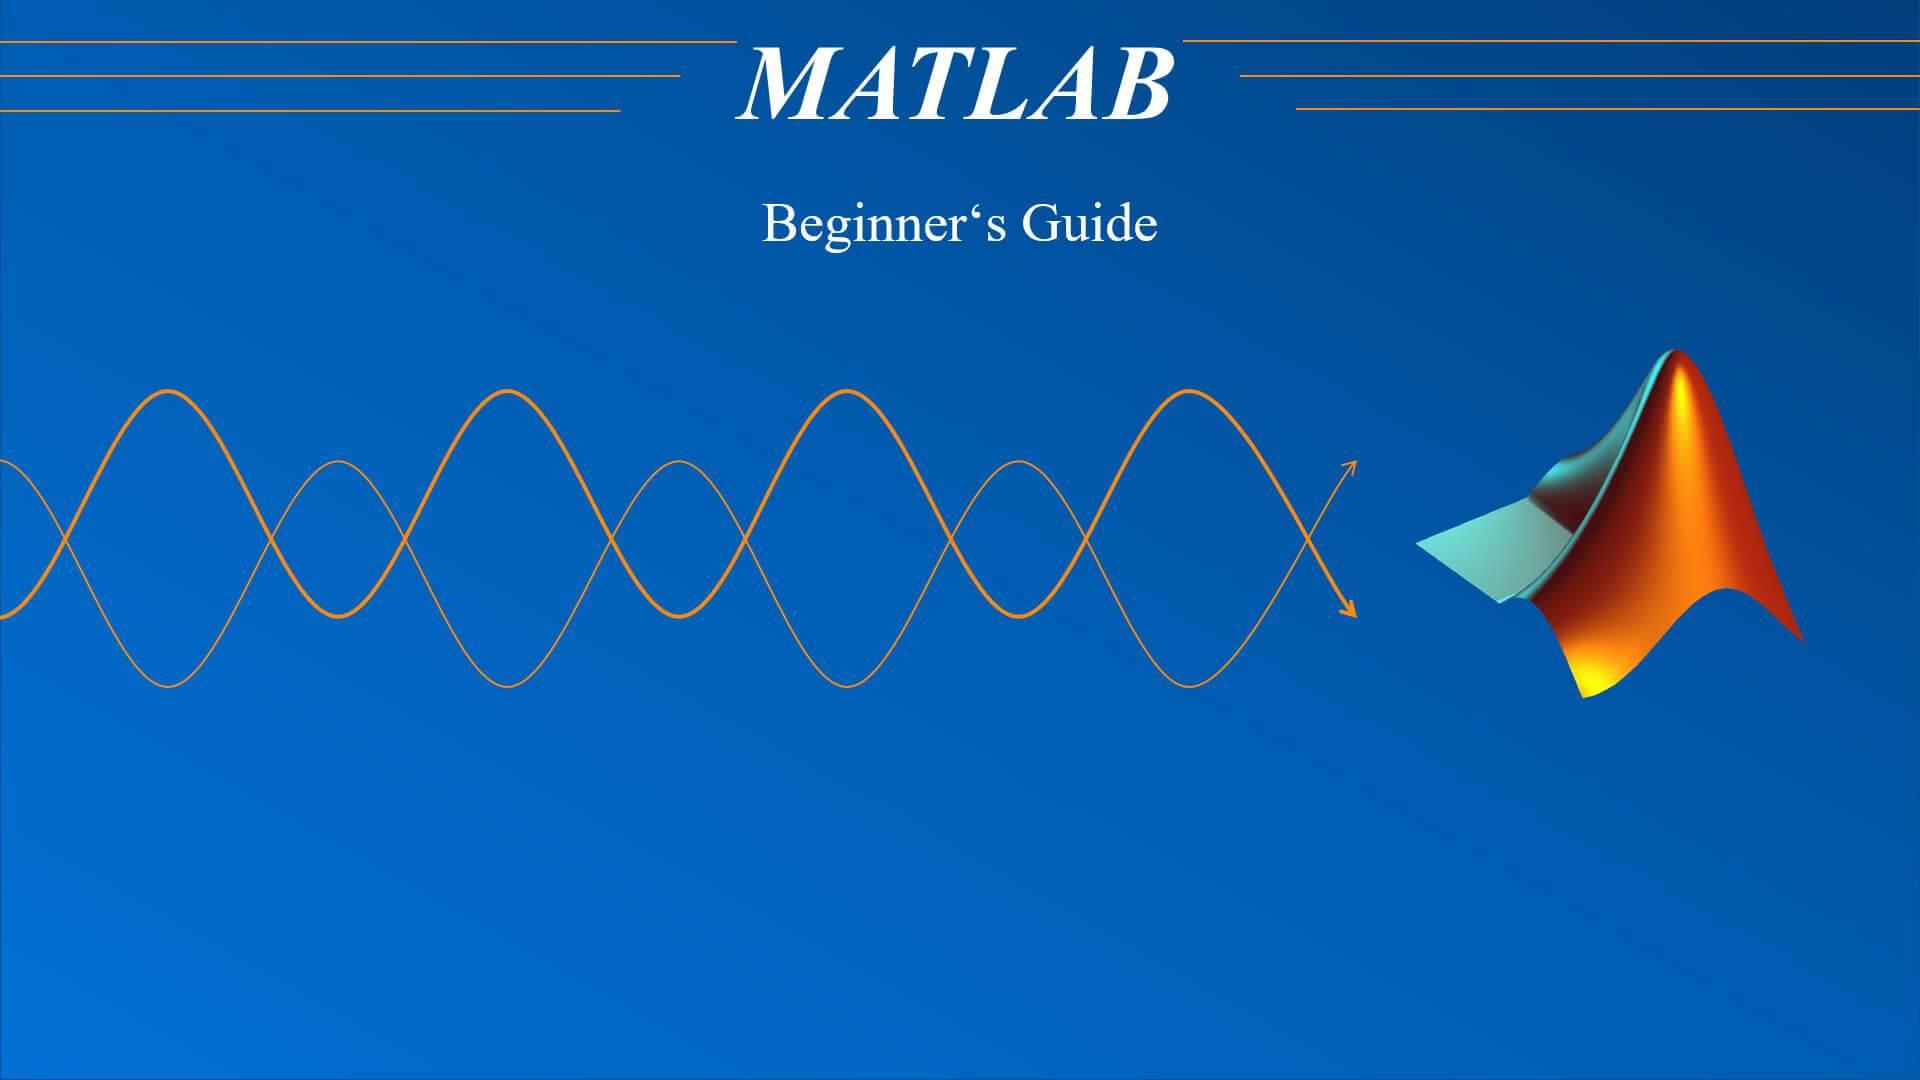 Octave Matlab 教程